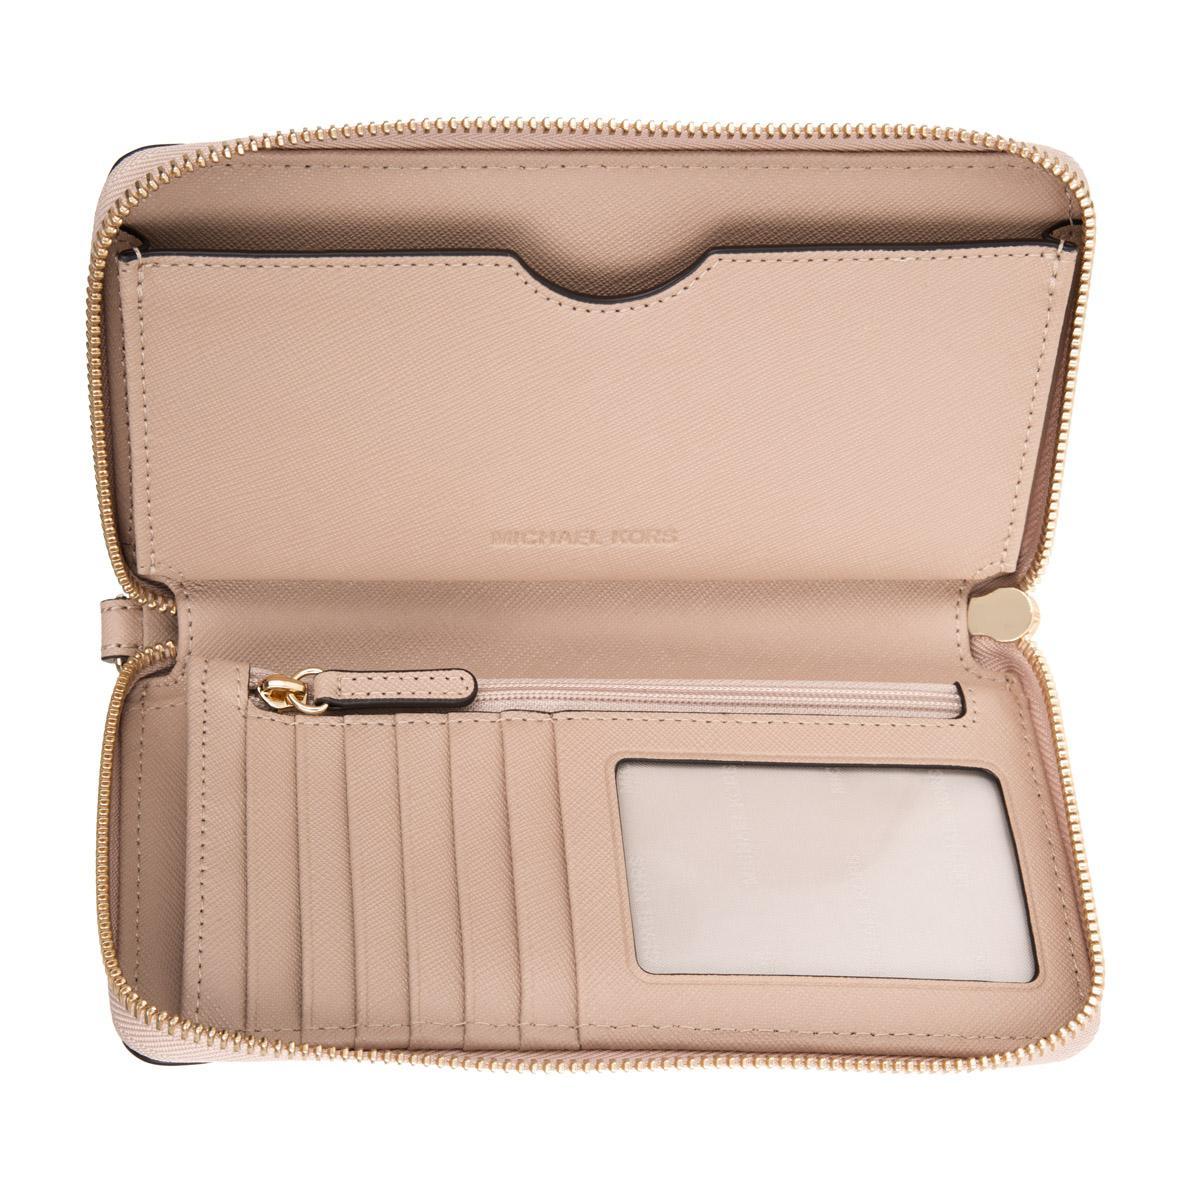 45fee2e6ad30 Michael Kors Mercer Lg Flat Multifunction Phone Case Leather Oyster ...